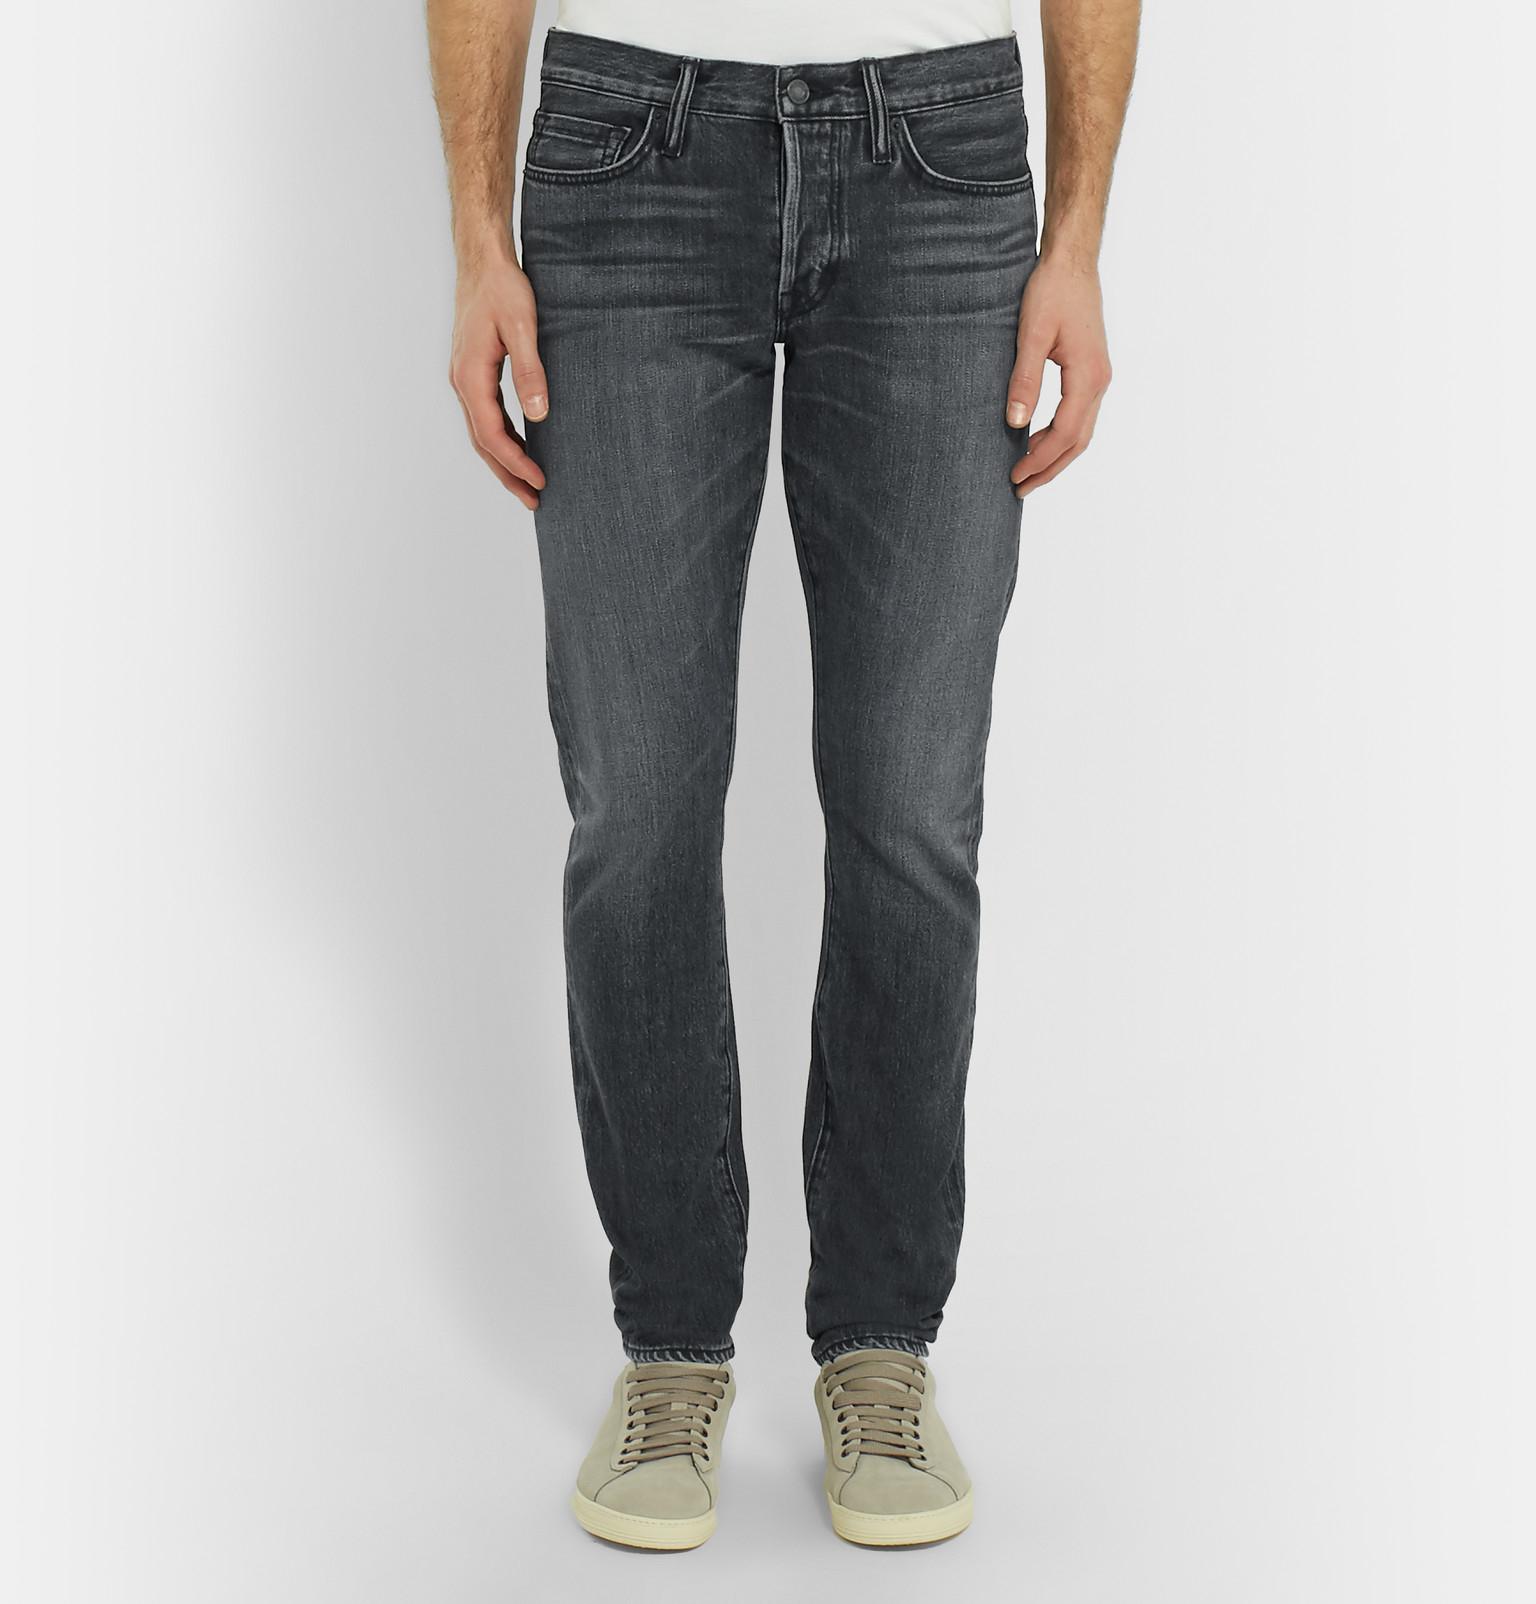 slim-fit jeans - Grey Tom Ford xDPkuBm